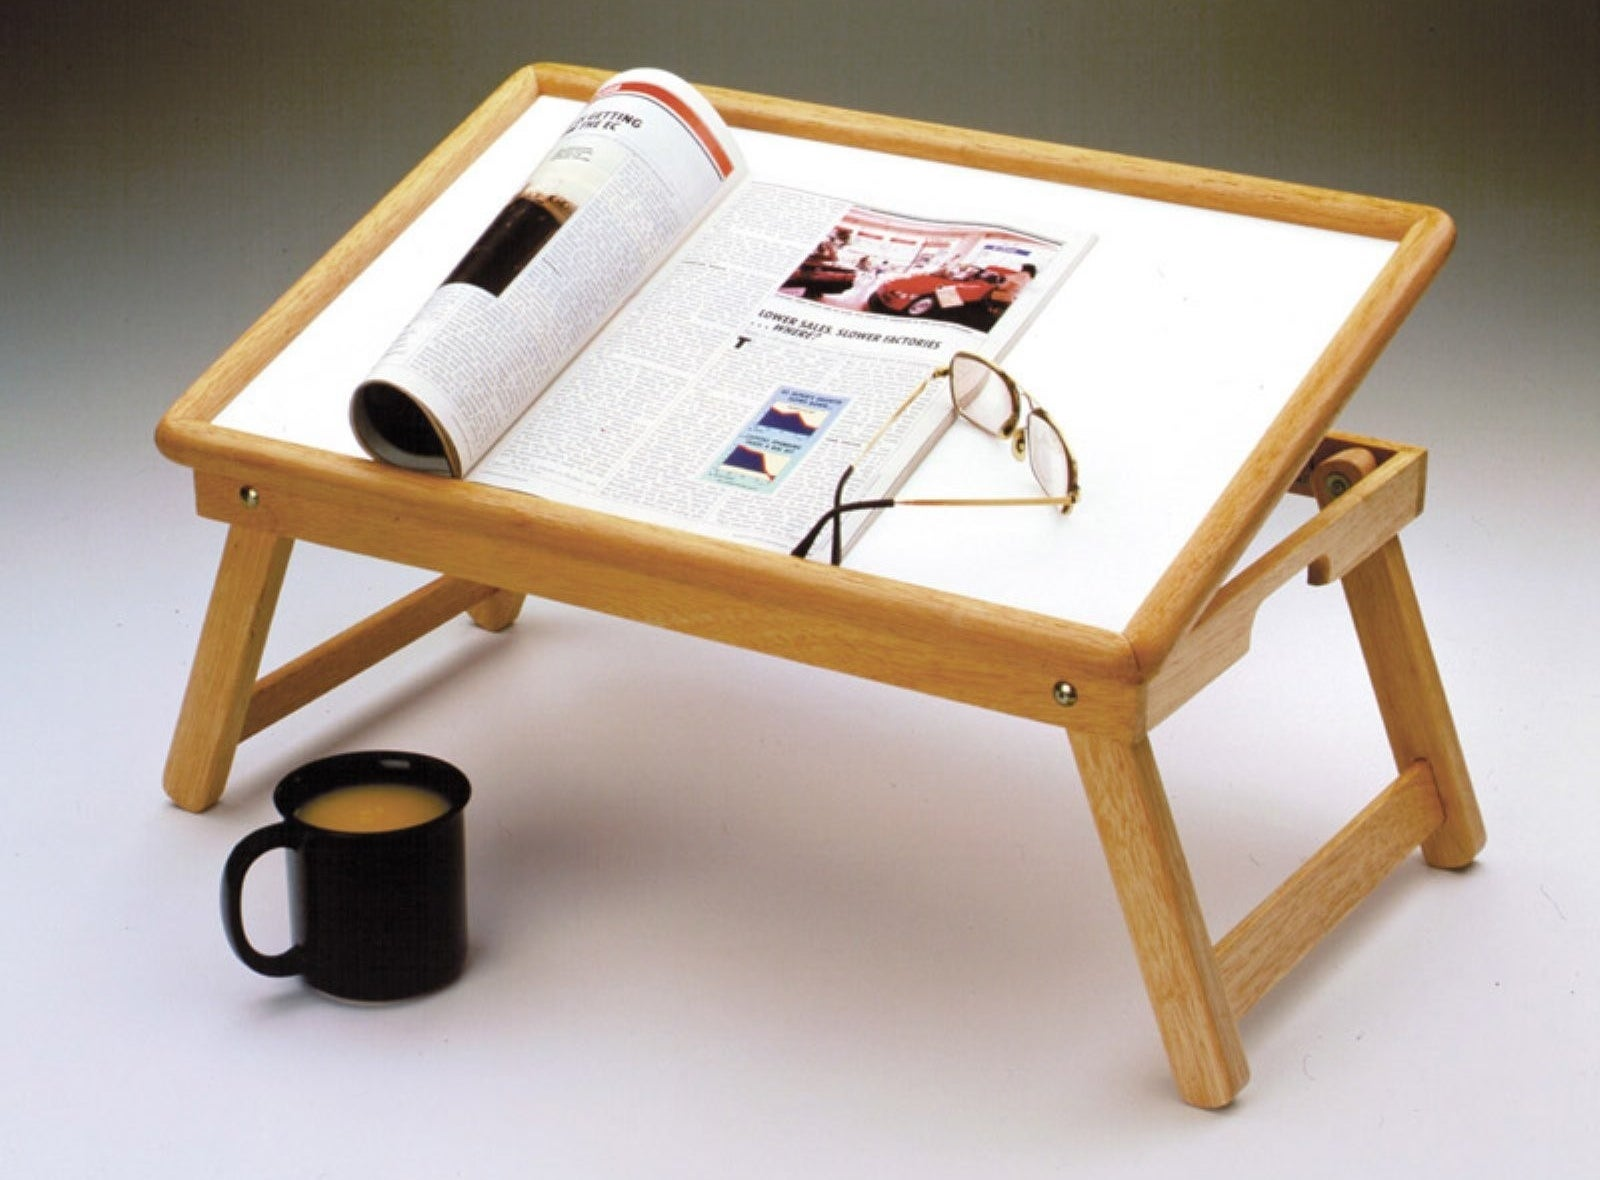 Beechwood Flip-Top Bed Tray